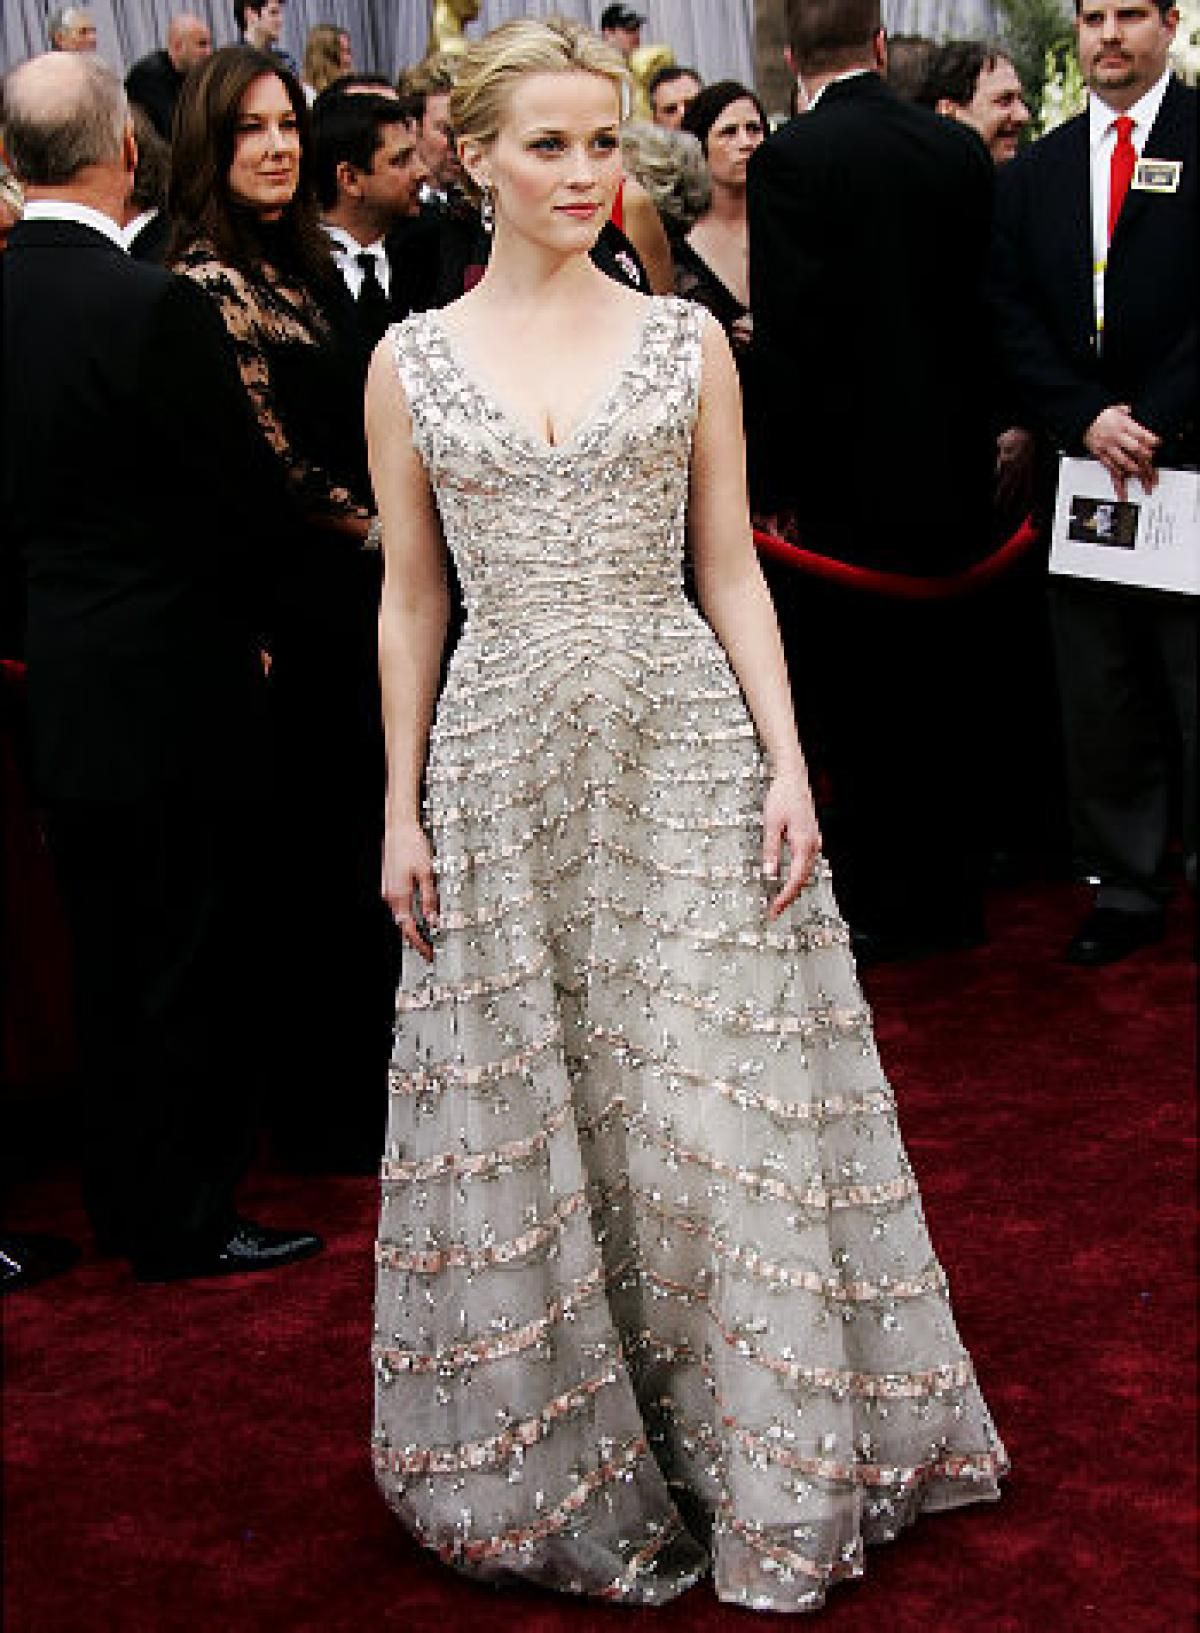 Oscars Fashion Best Academy Awards Red Carpet Gowns Of All Time Red Carpet Gowns Oscar Fashion Golden Globes Dresses